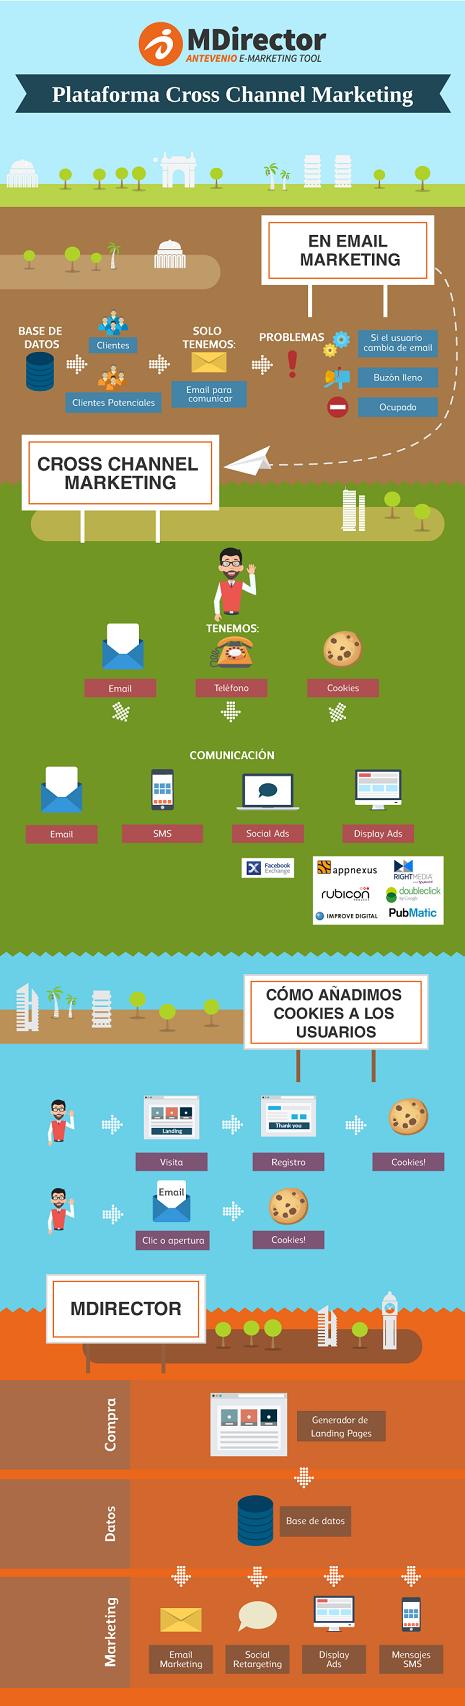 MDirector - Cross Channel Marketing Tool - ES